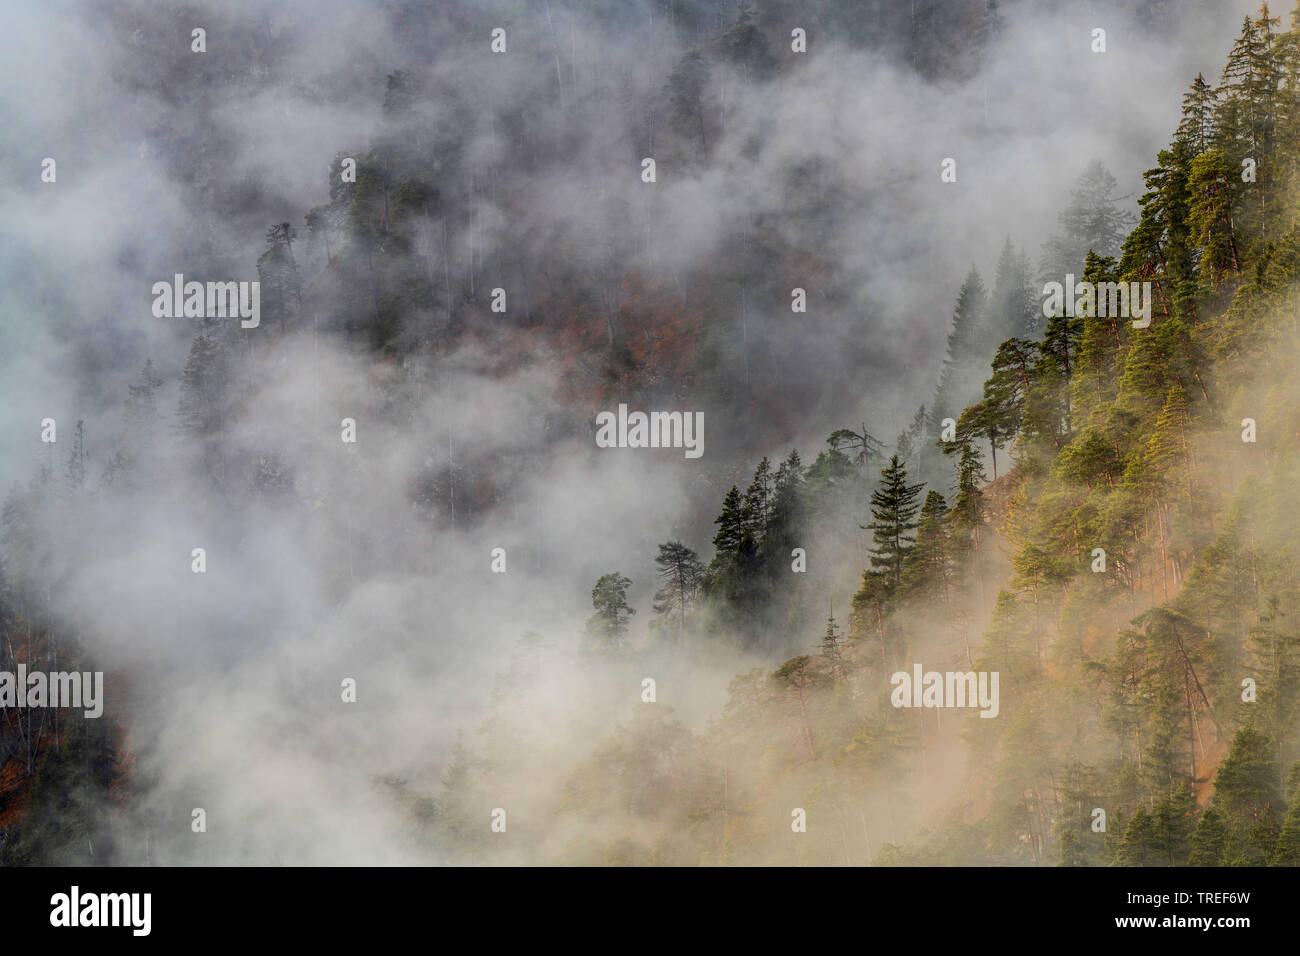 trees on a mist-shrouded mountain slope, Germany, Bavaria Stock Photo